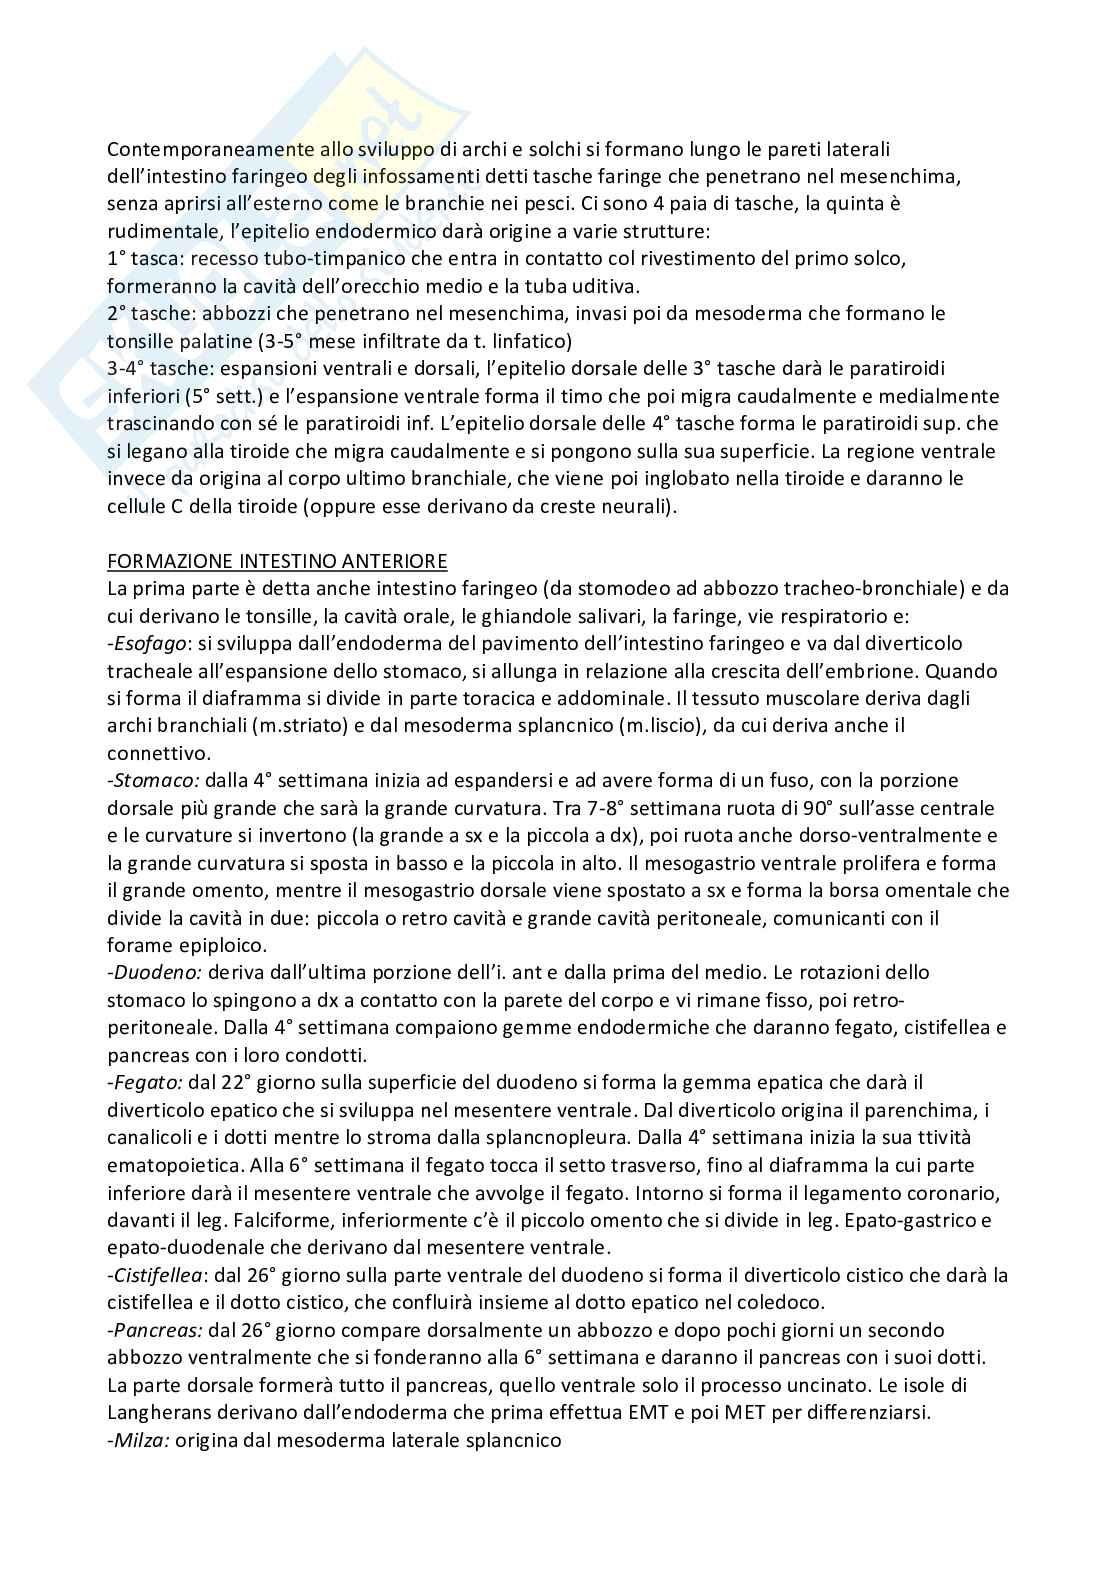 Riassunto embriologia, prof. De Felici, libro consigliato Embriologia Umana, De Felici et al, Piccin Pag. 31